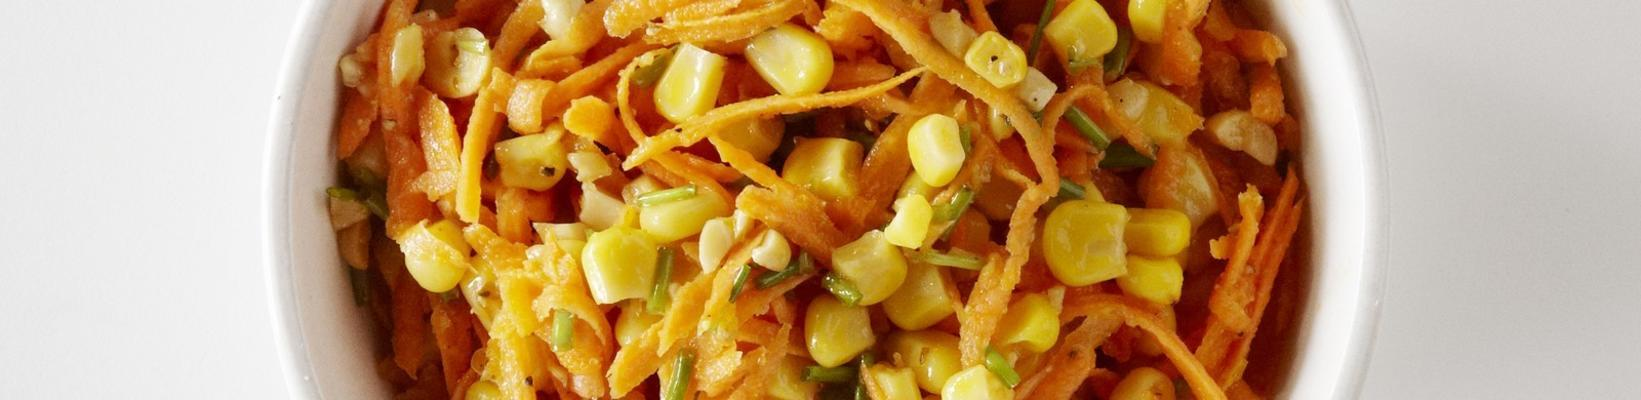 raw carrot salad with corn